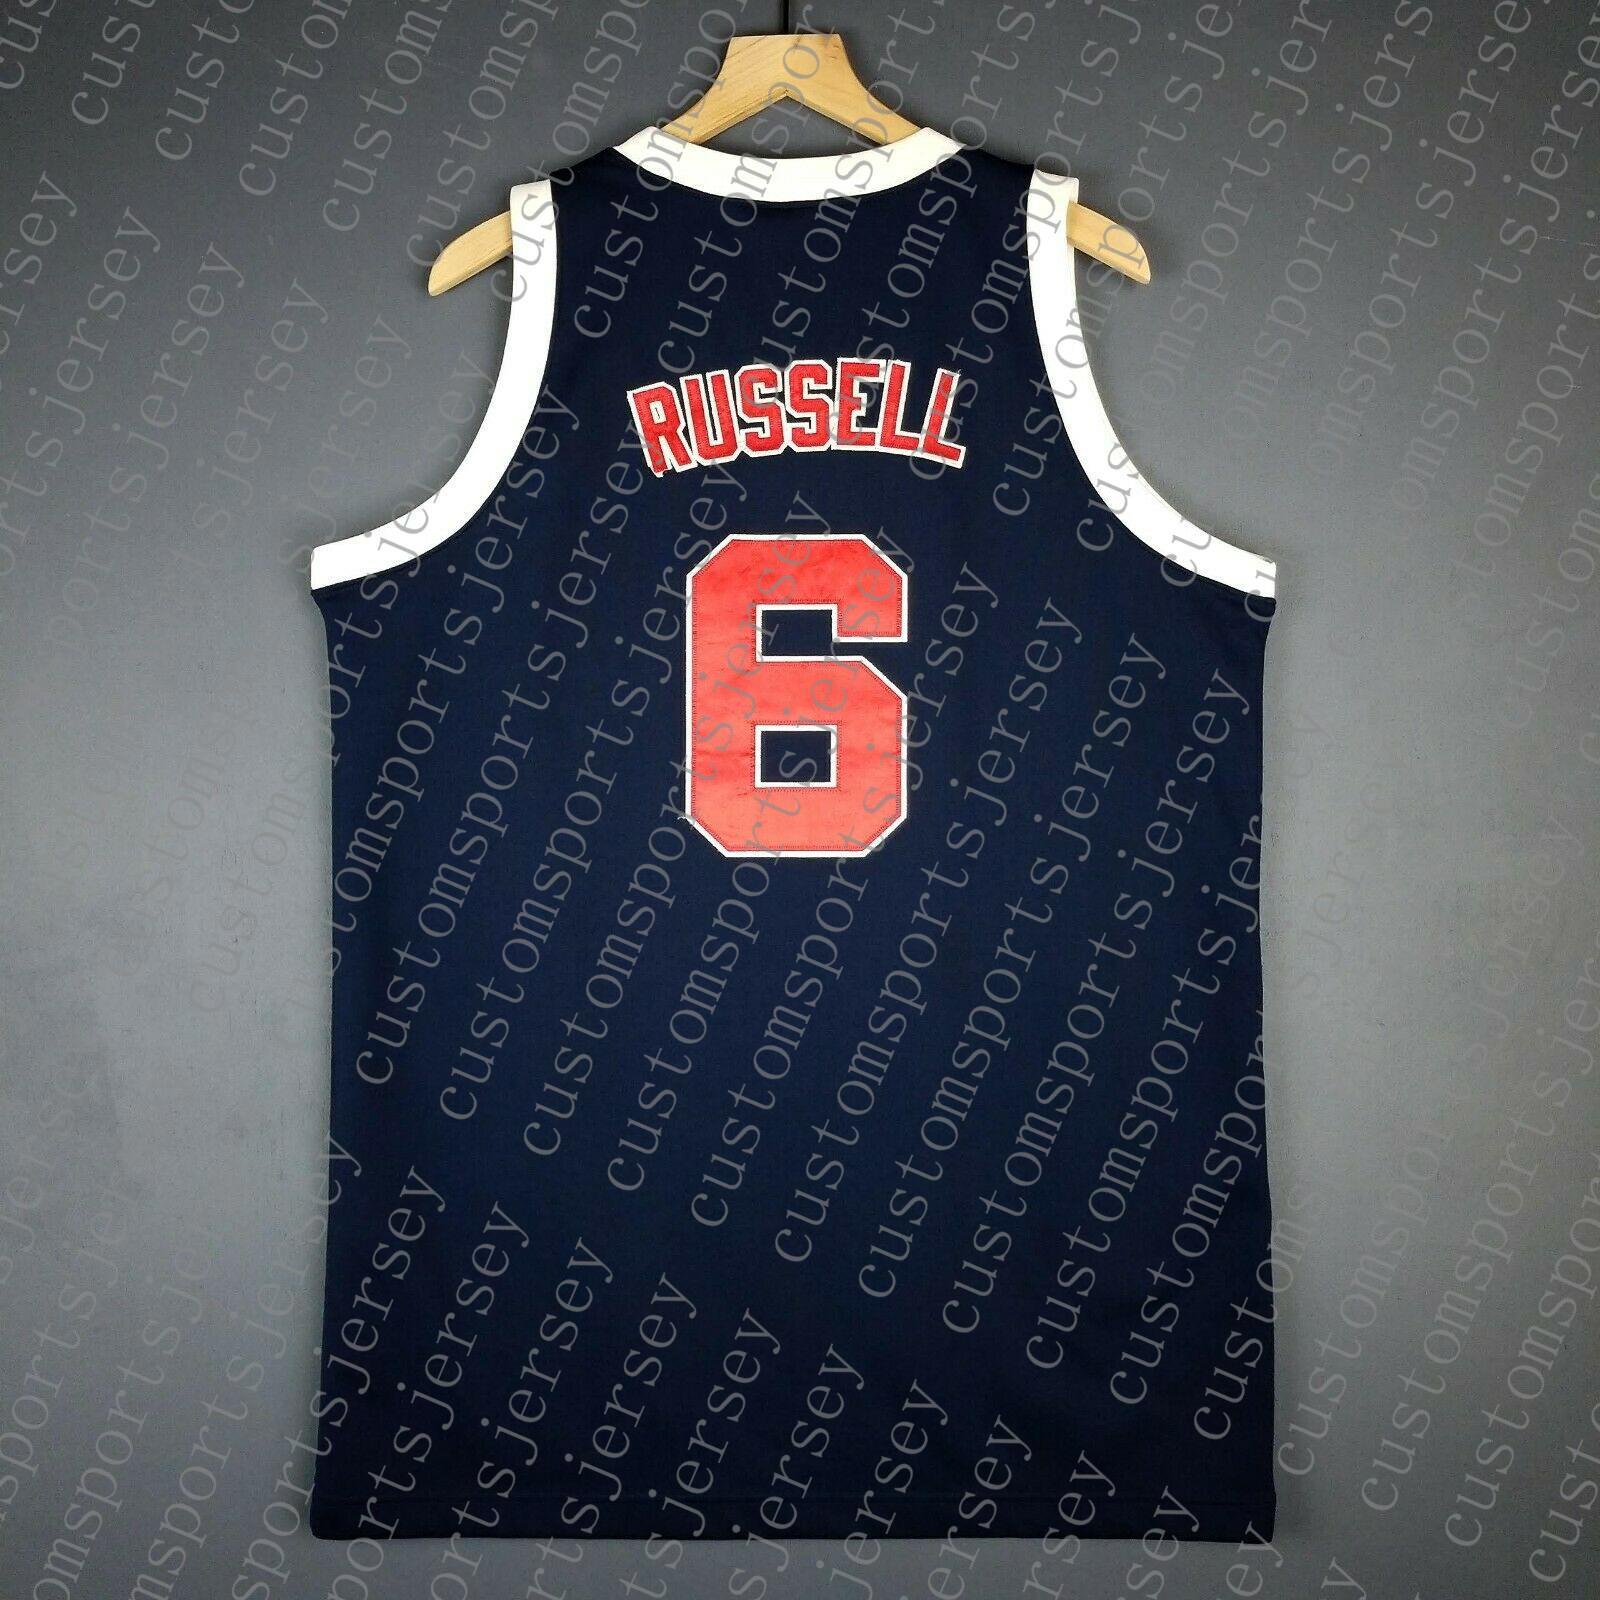 100% cosido Bill Russell Juegos Olímpicos de baloncesto Jersey cosido jerseys NCAA Tamaño XS-6XL